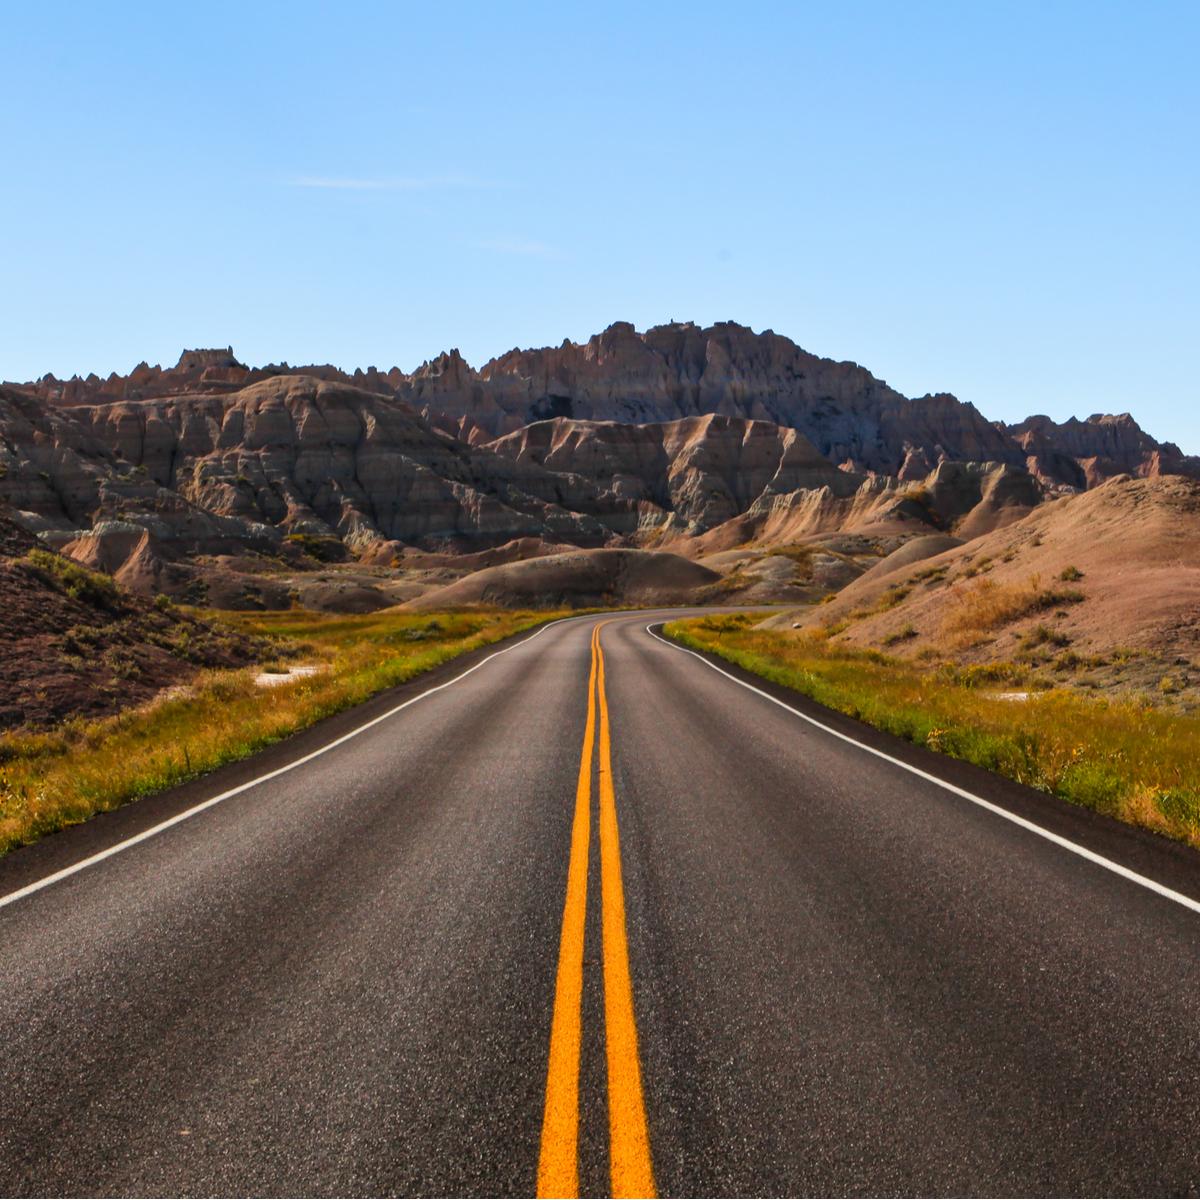 Highway through the badlands.